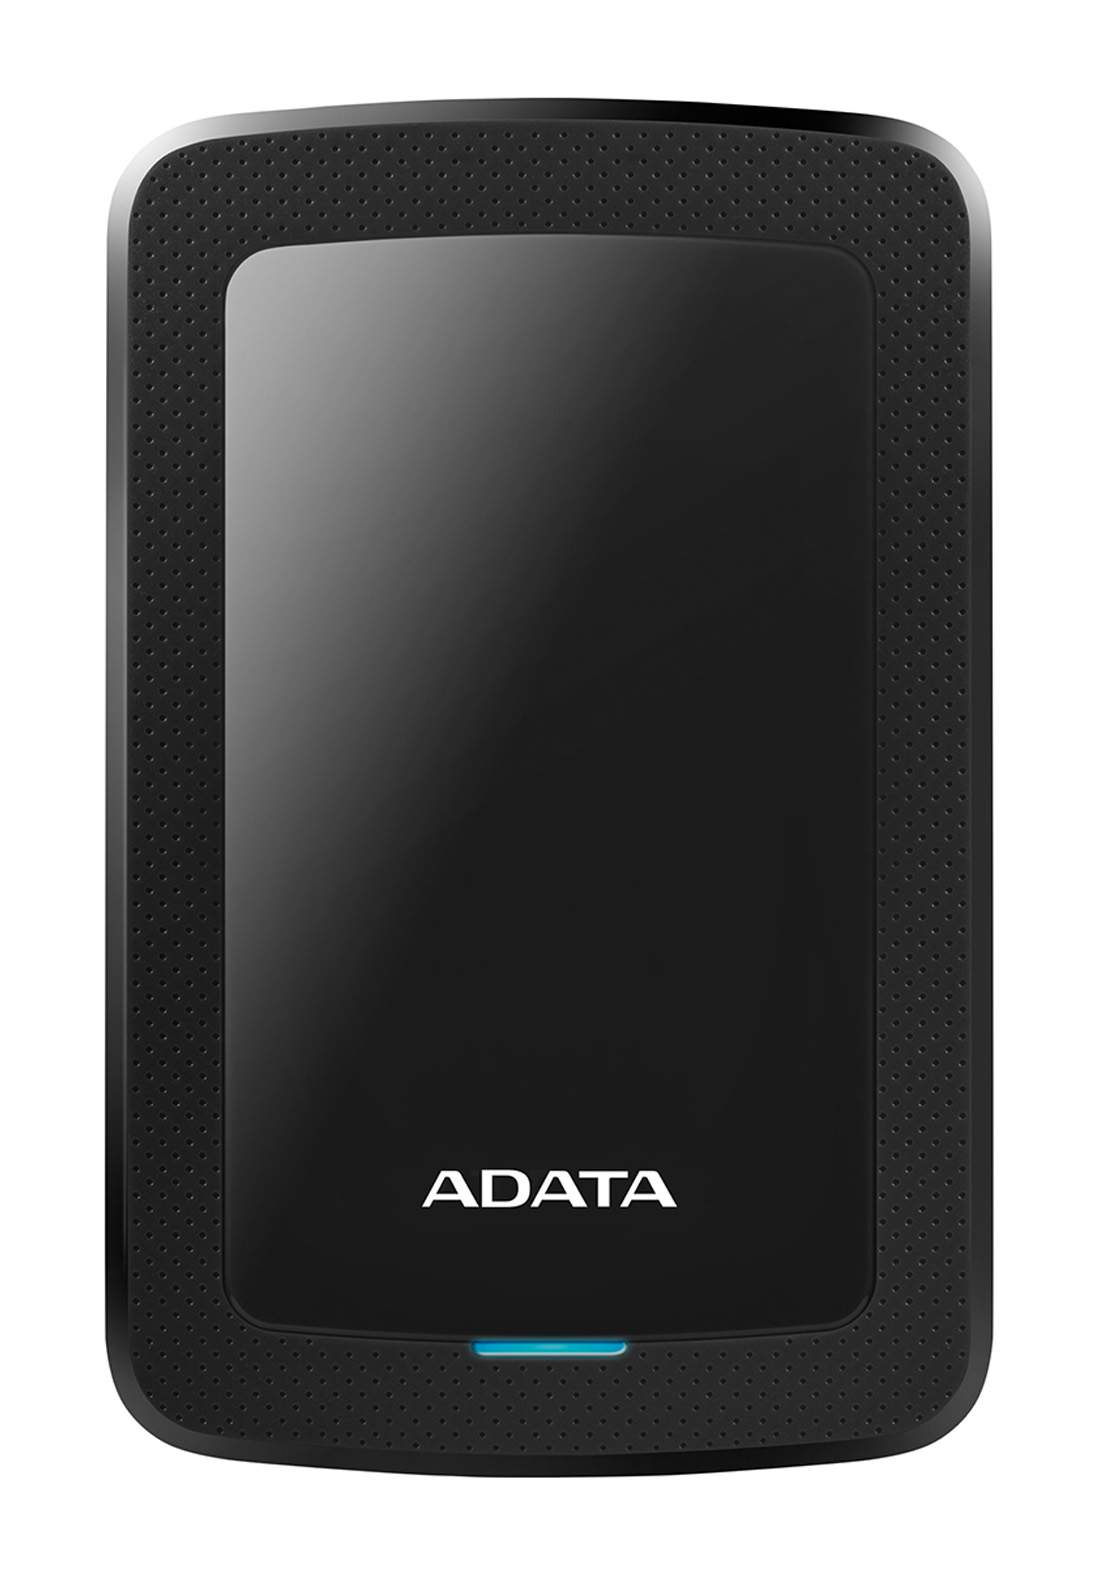 ADATA HV300 4TB Silm External Hard Drive - Black هارد خارجي